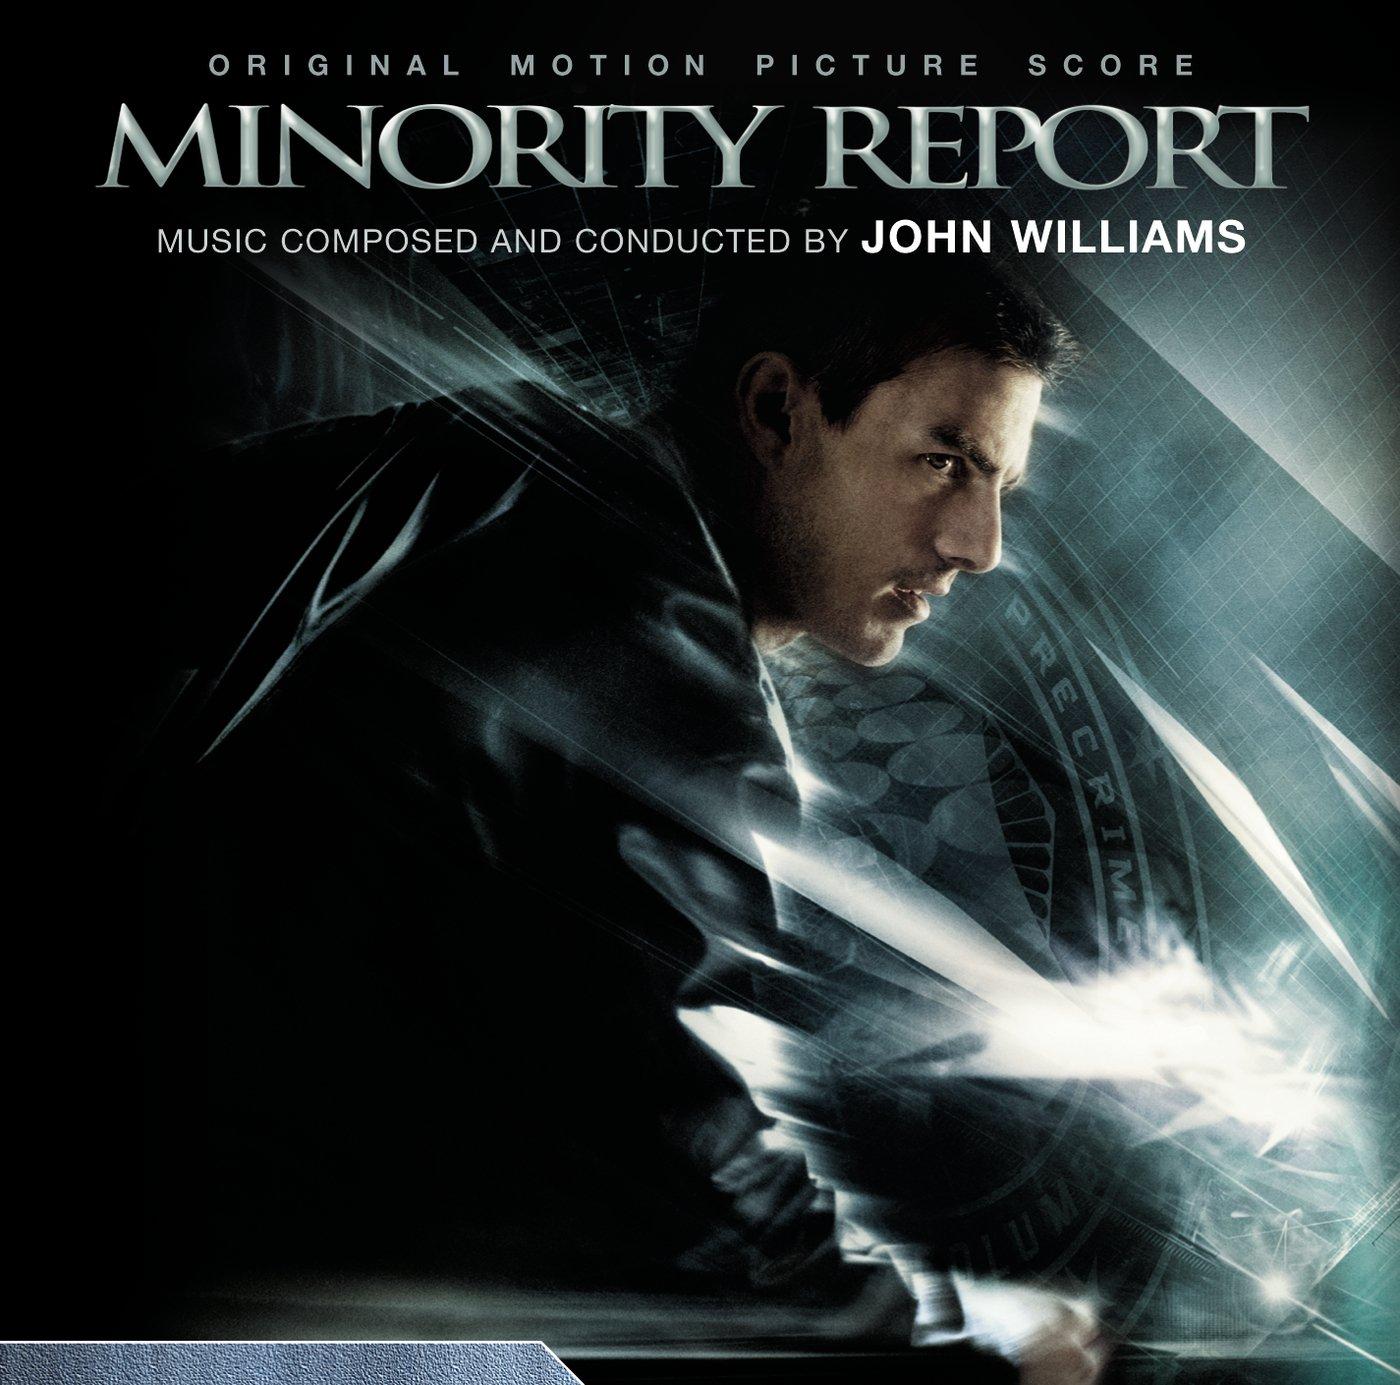 bande originale soundtrack ost score minority report disney fox